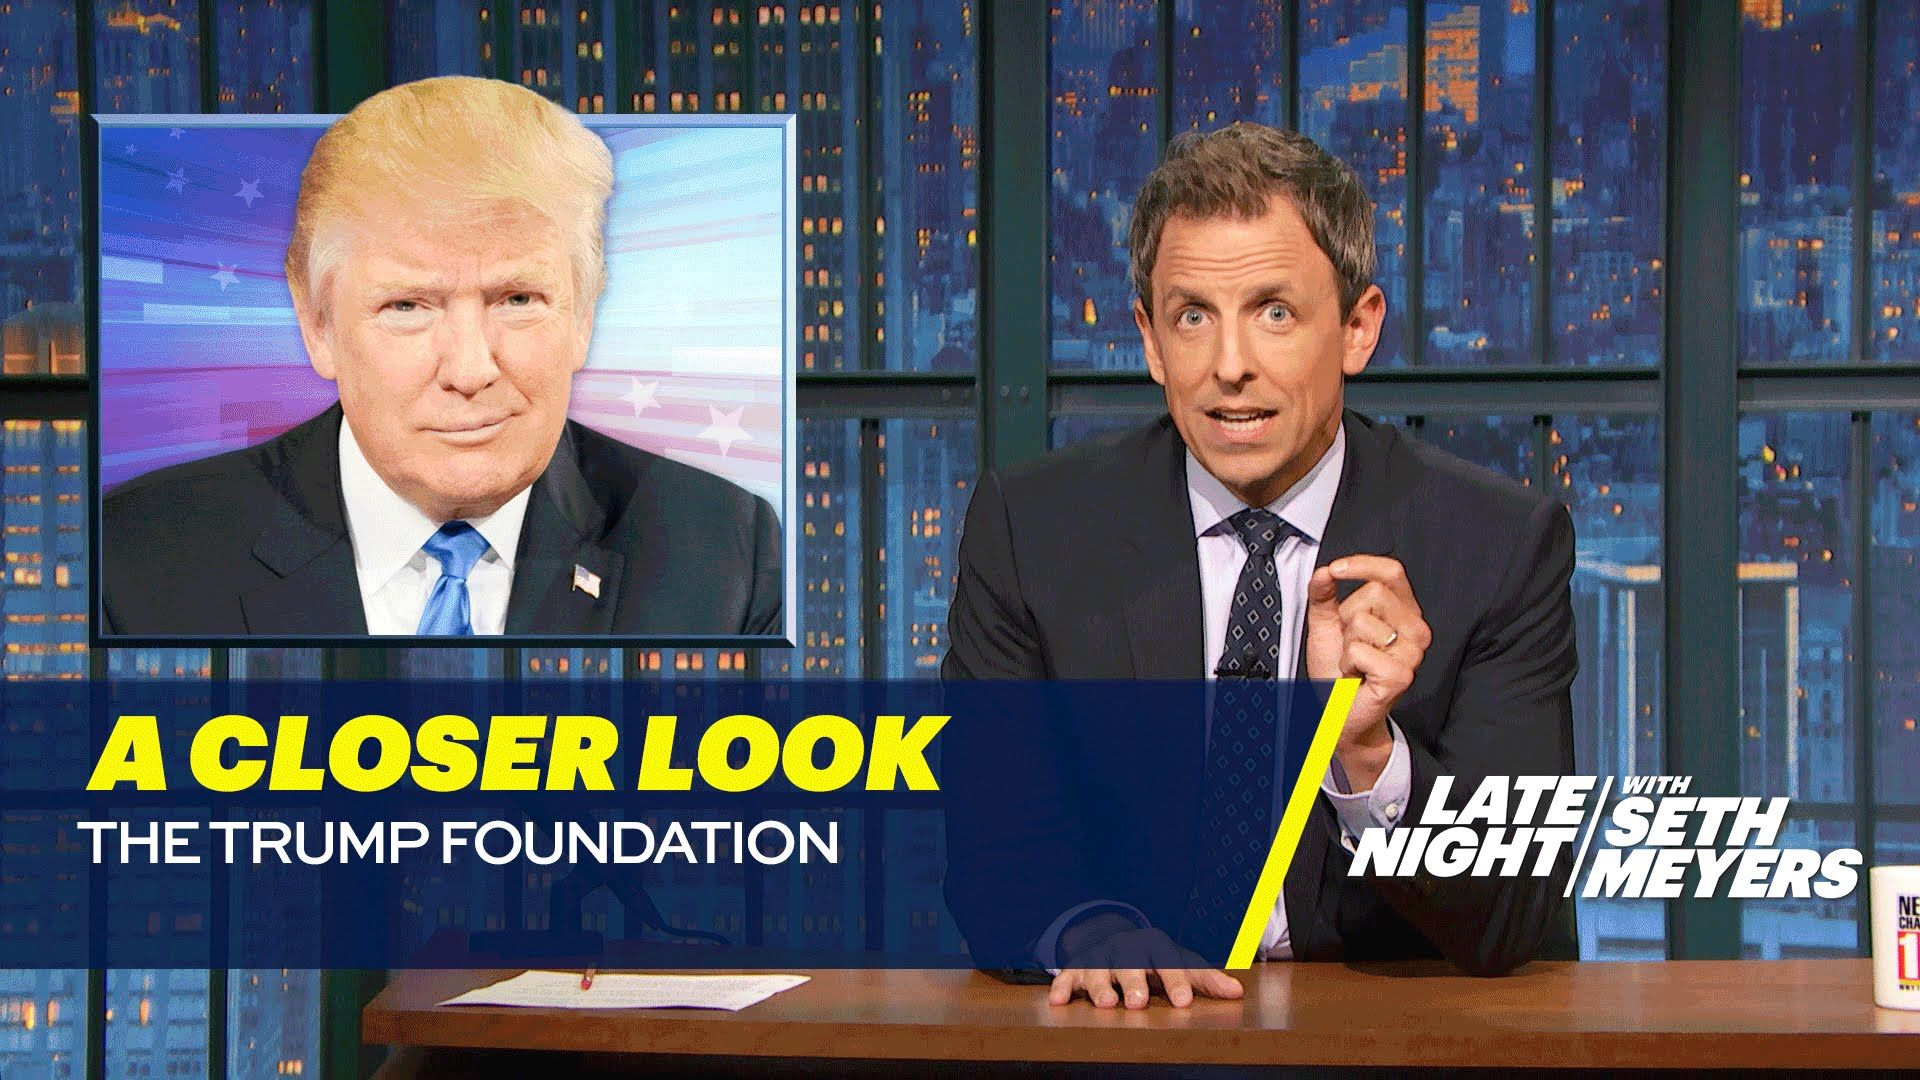 A Closer Look The Trump Foundation